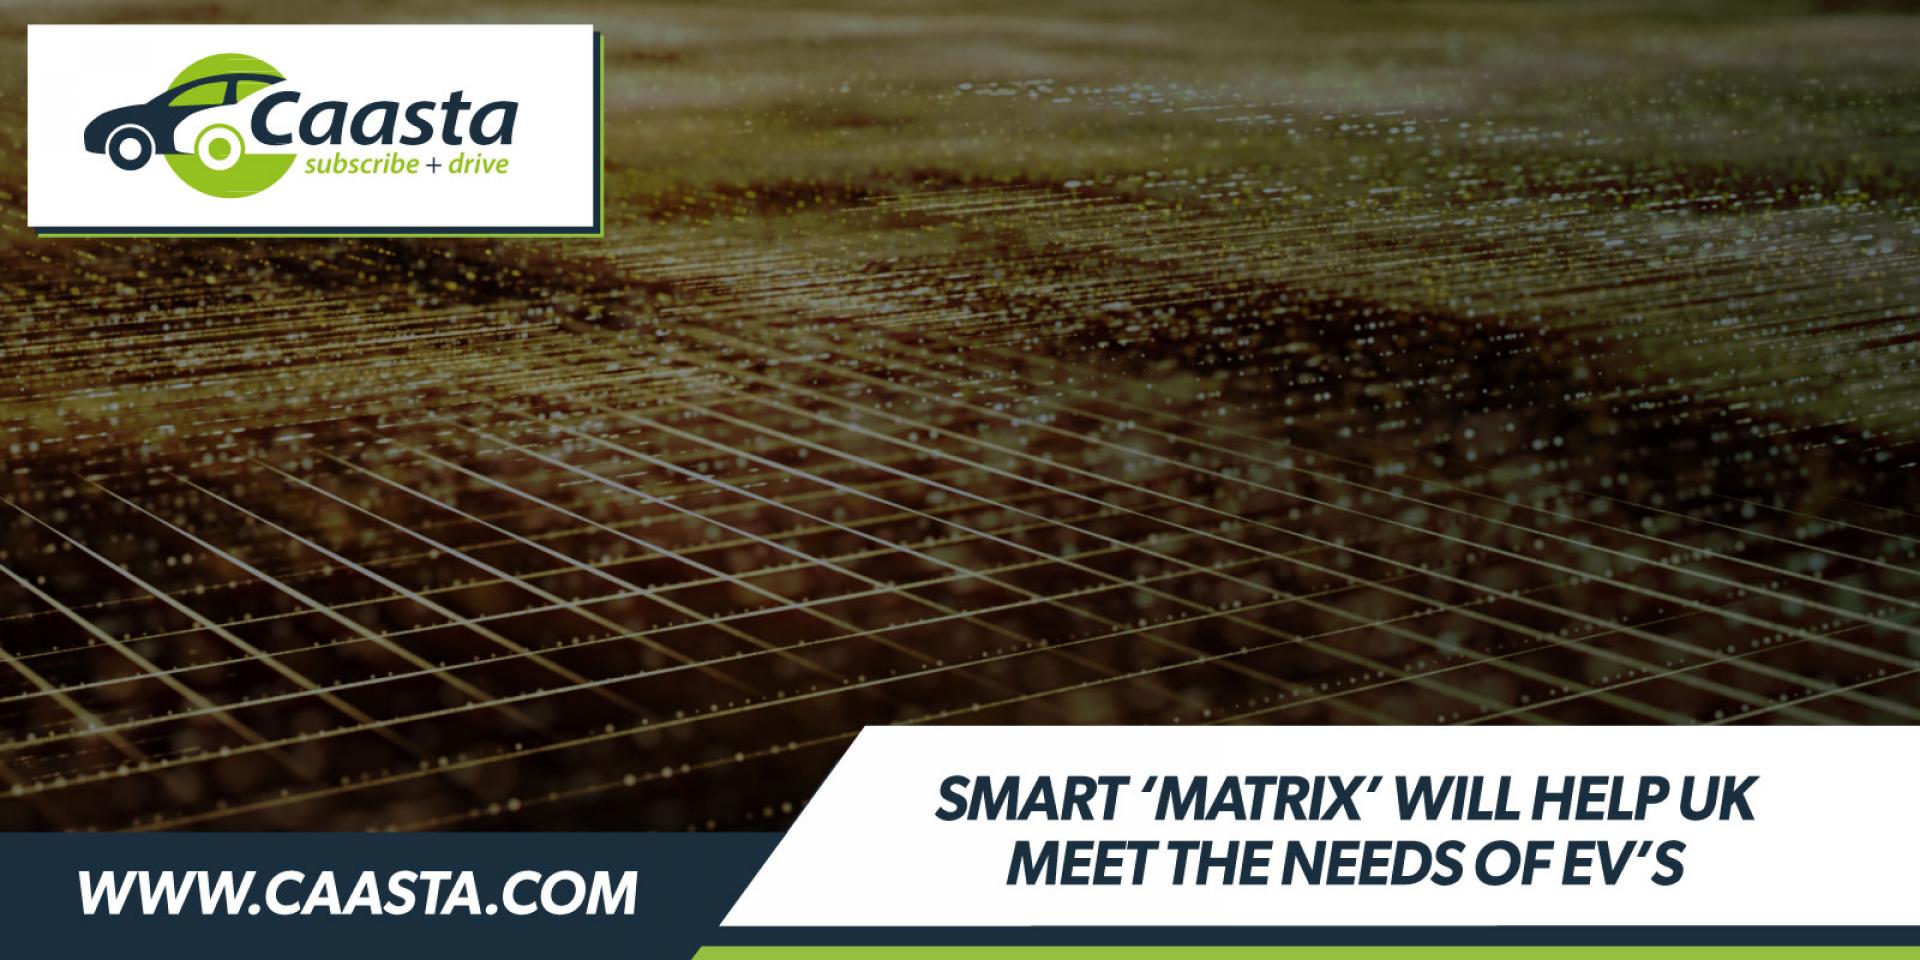 Smart 'matrix' will help the UK meet the energy needs of future electric vehicles